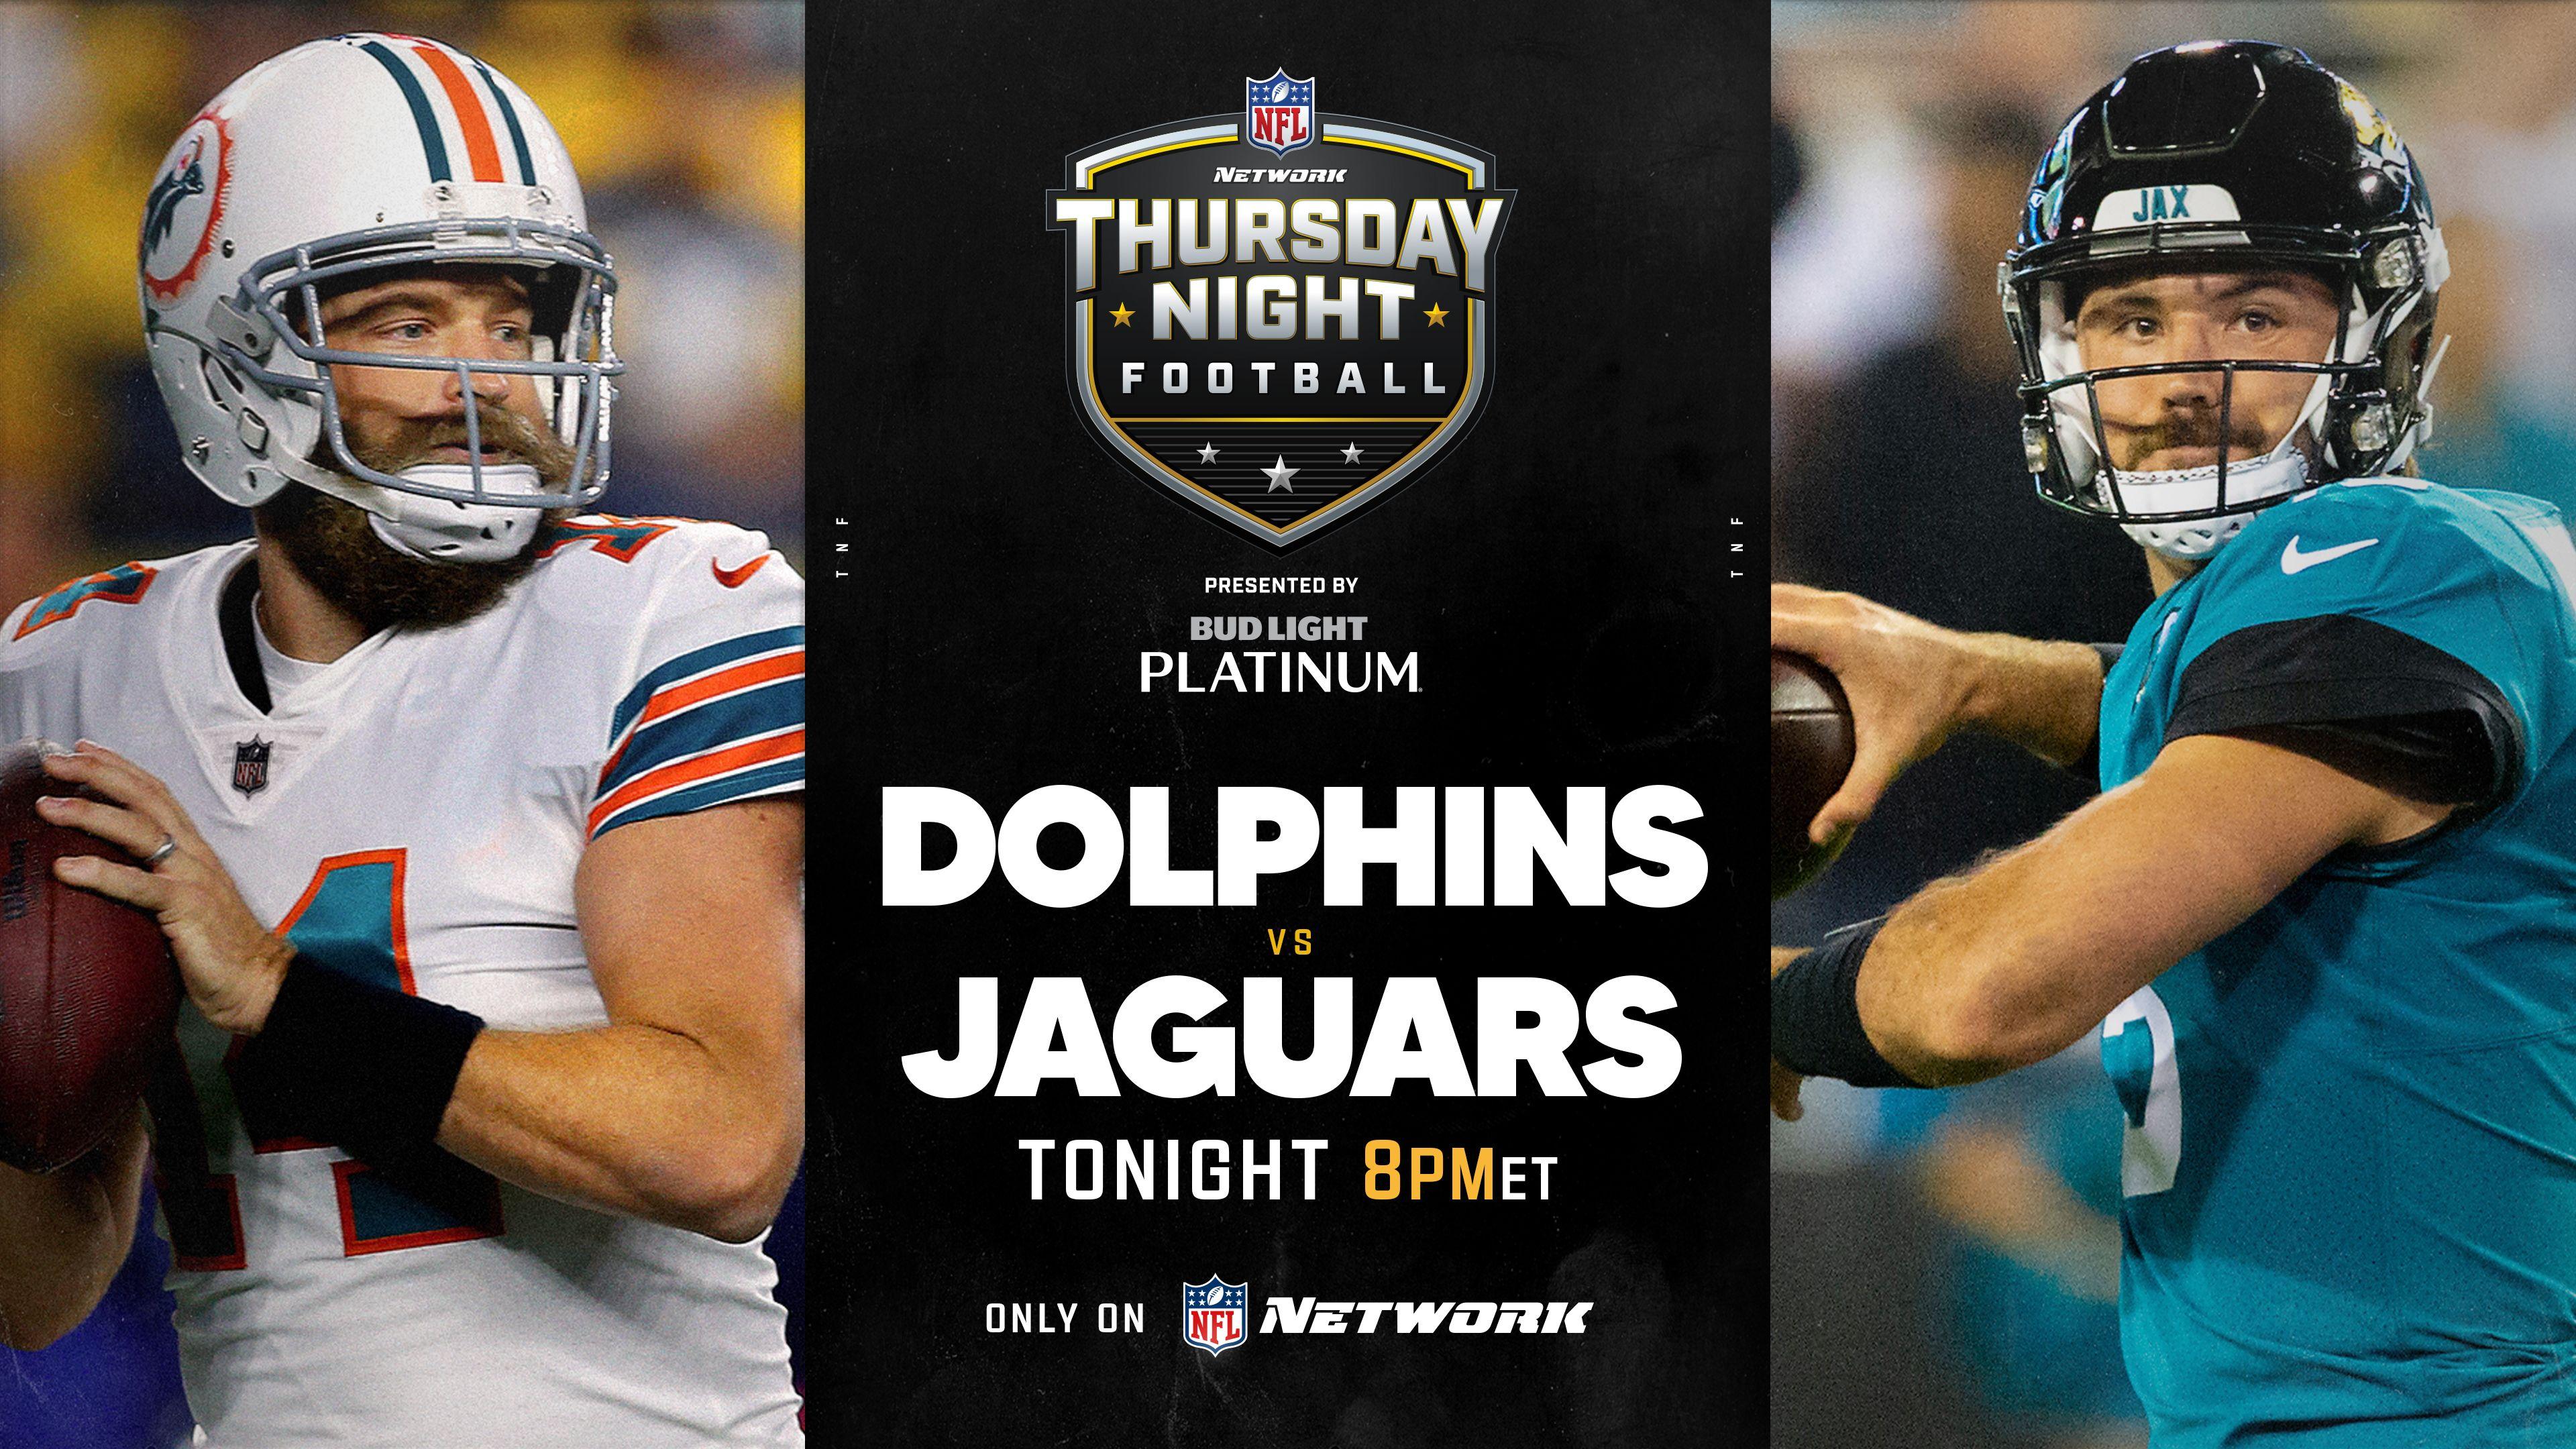 082-NFL-Network-Website-Hero-Image-3840x2160-Tonight